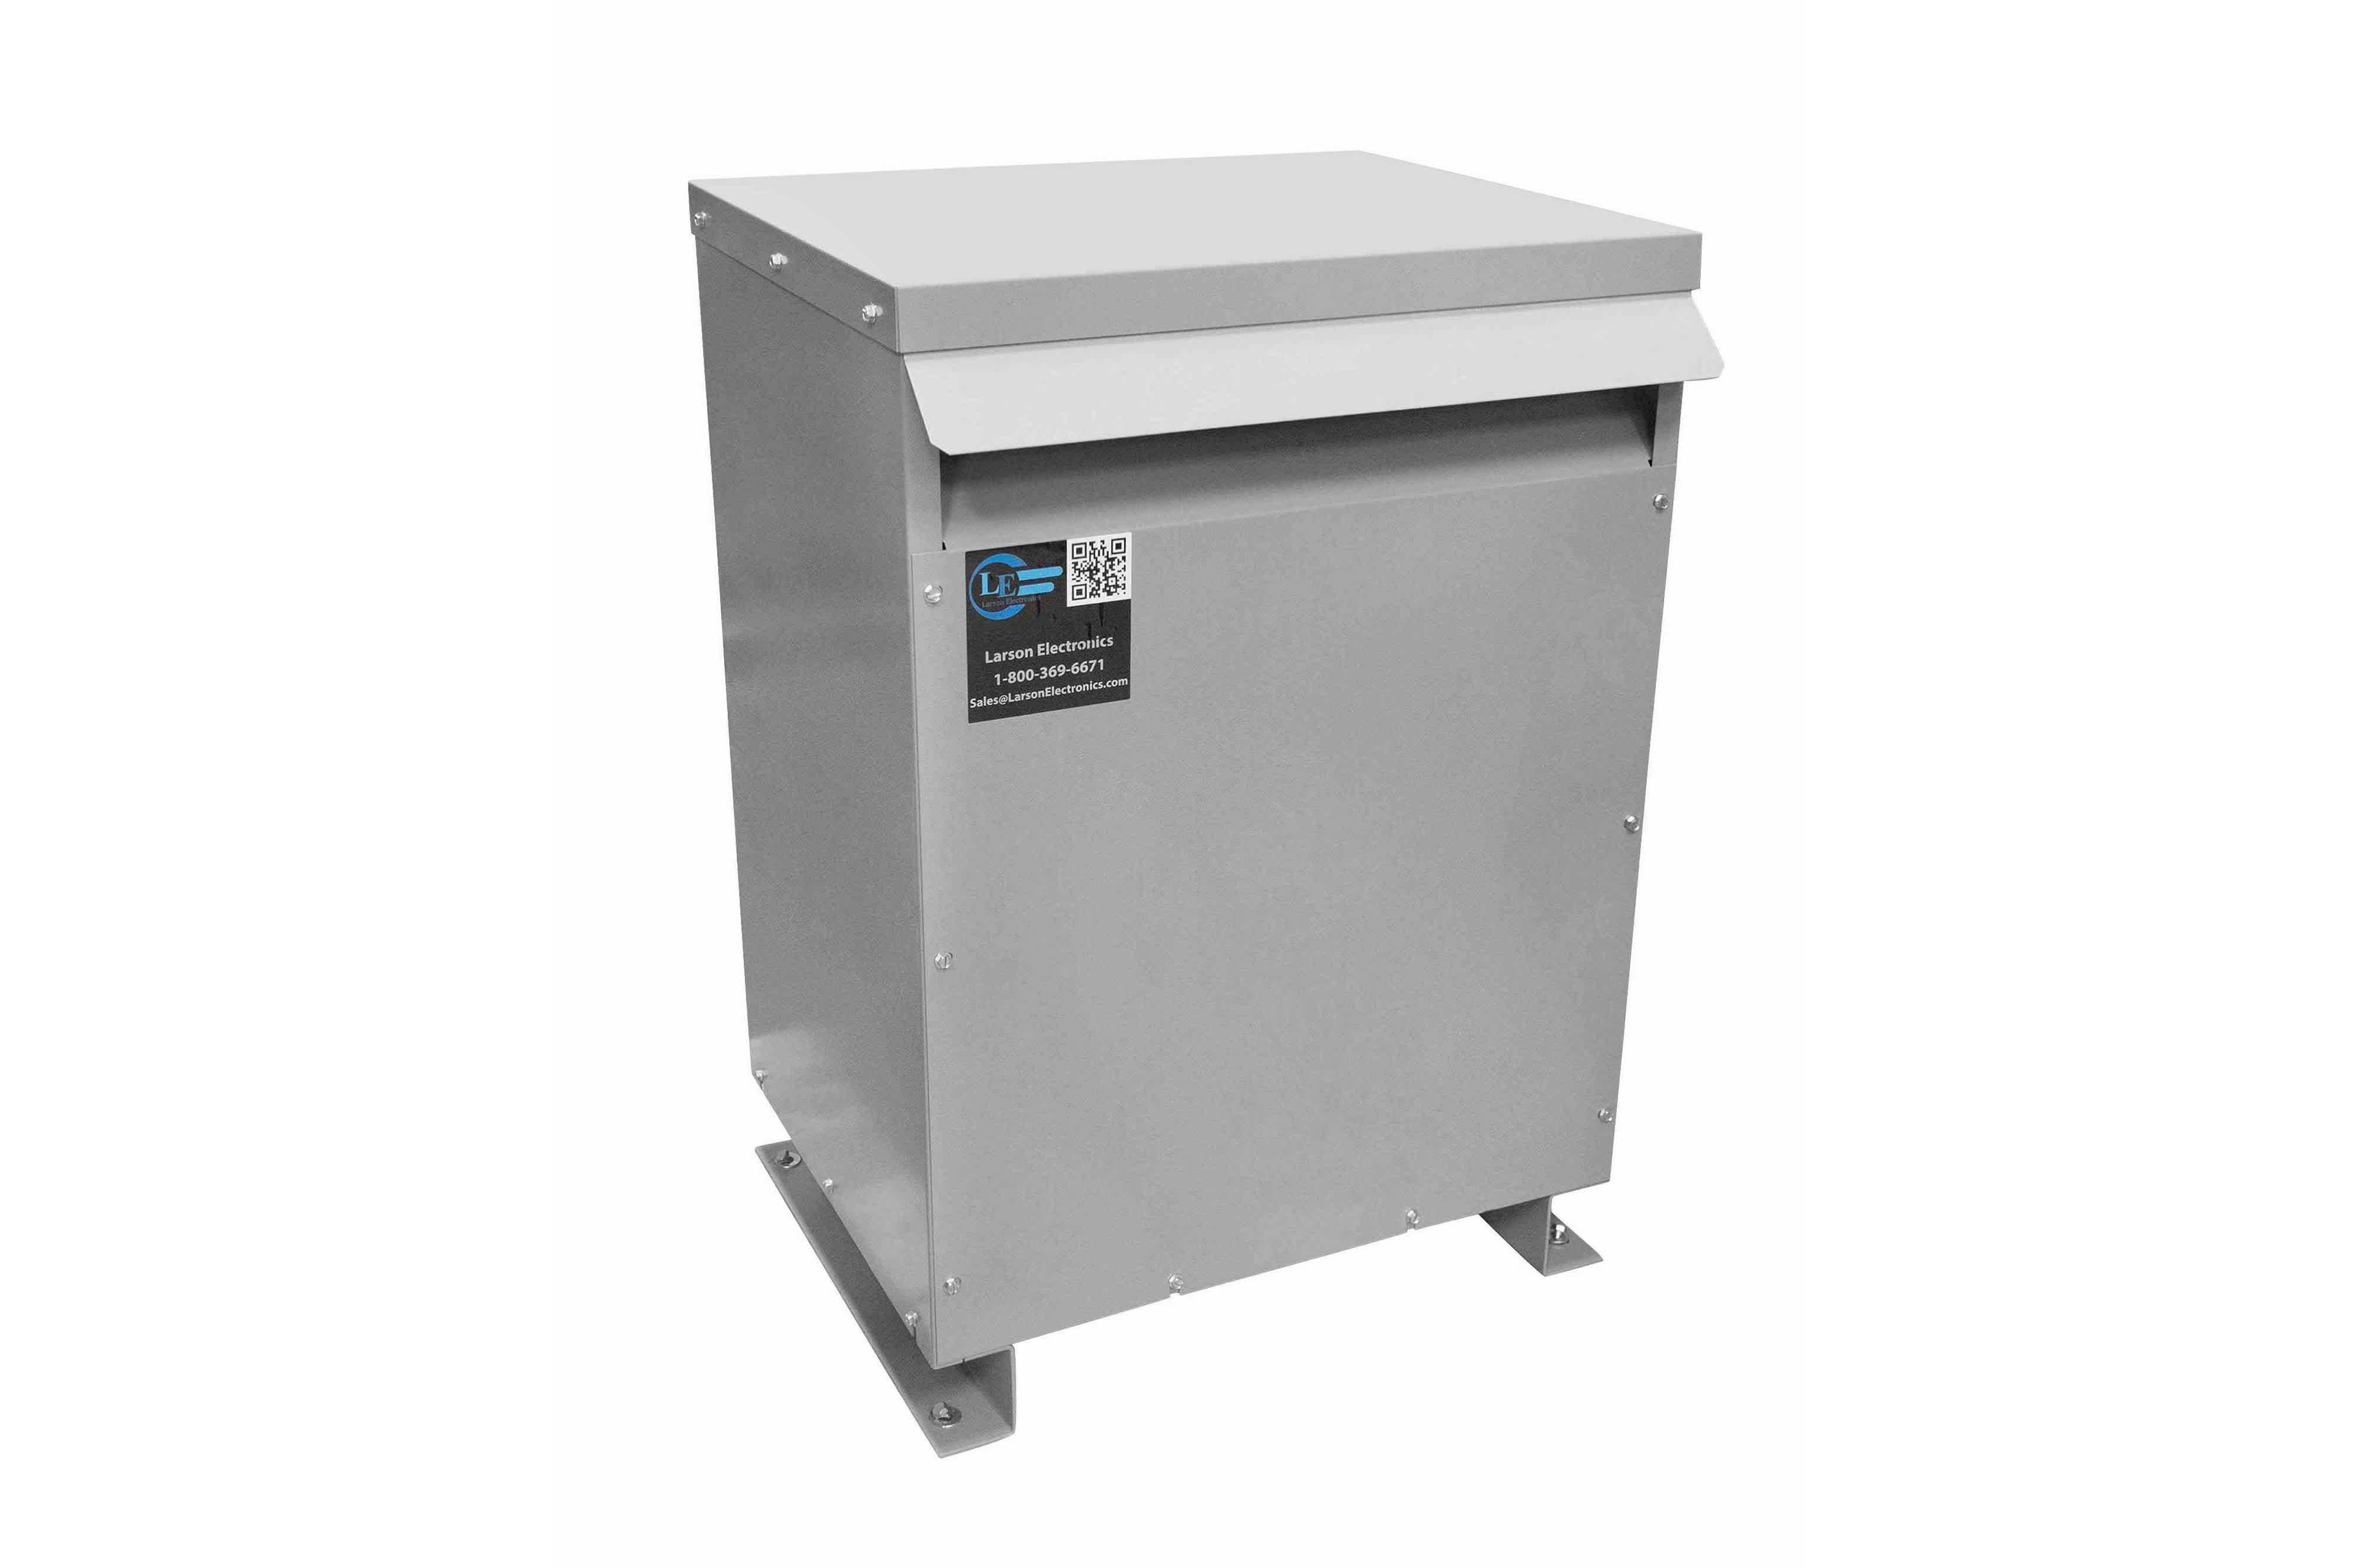 250 kVA 3PH Isolation Transformer, 600V Wye Primary, 240V/120 Delta Secondary, N3R, Ventilated, 60 Hz